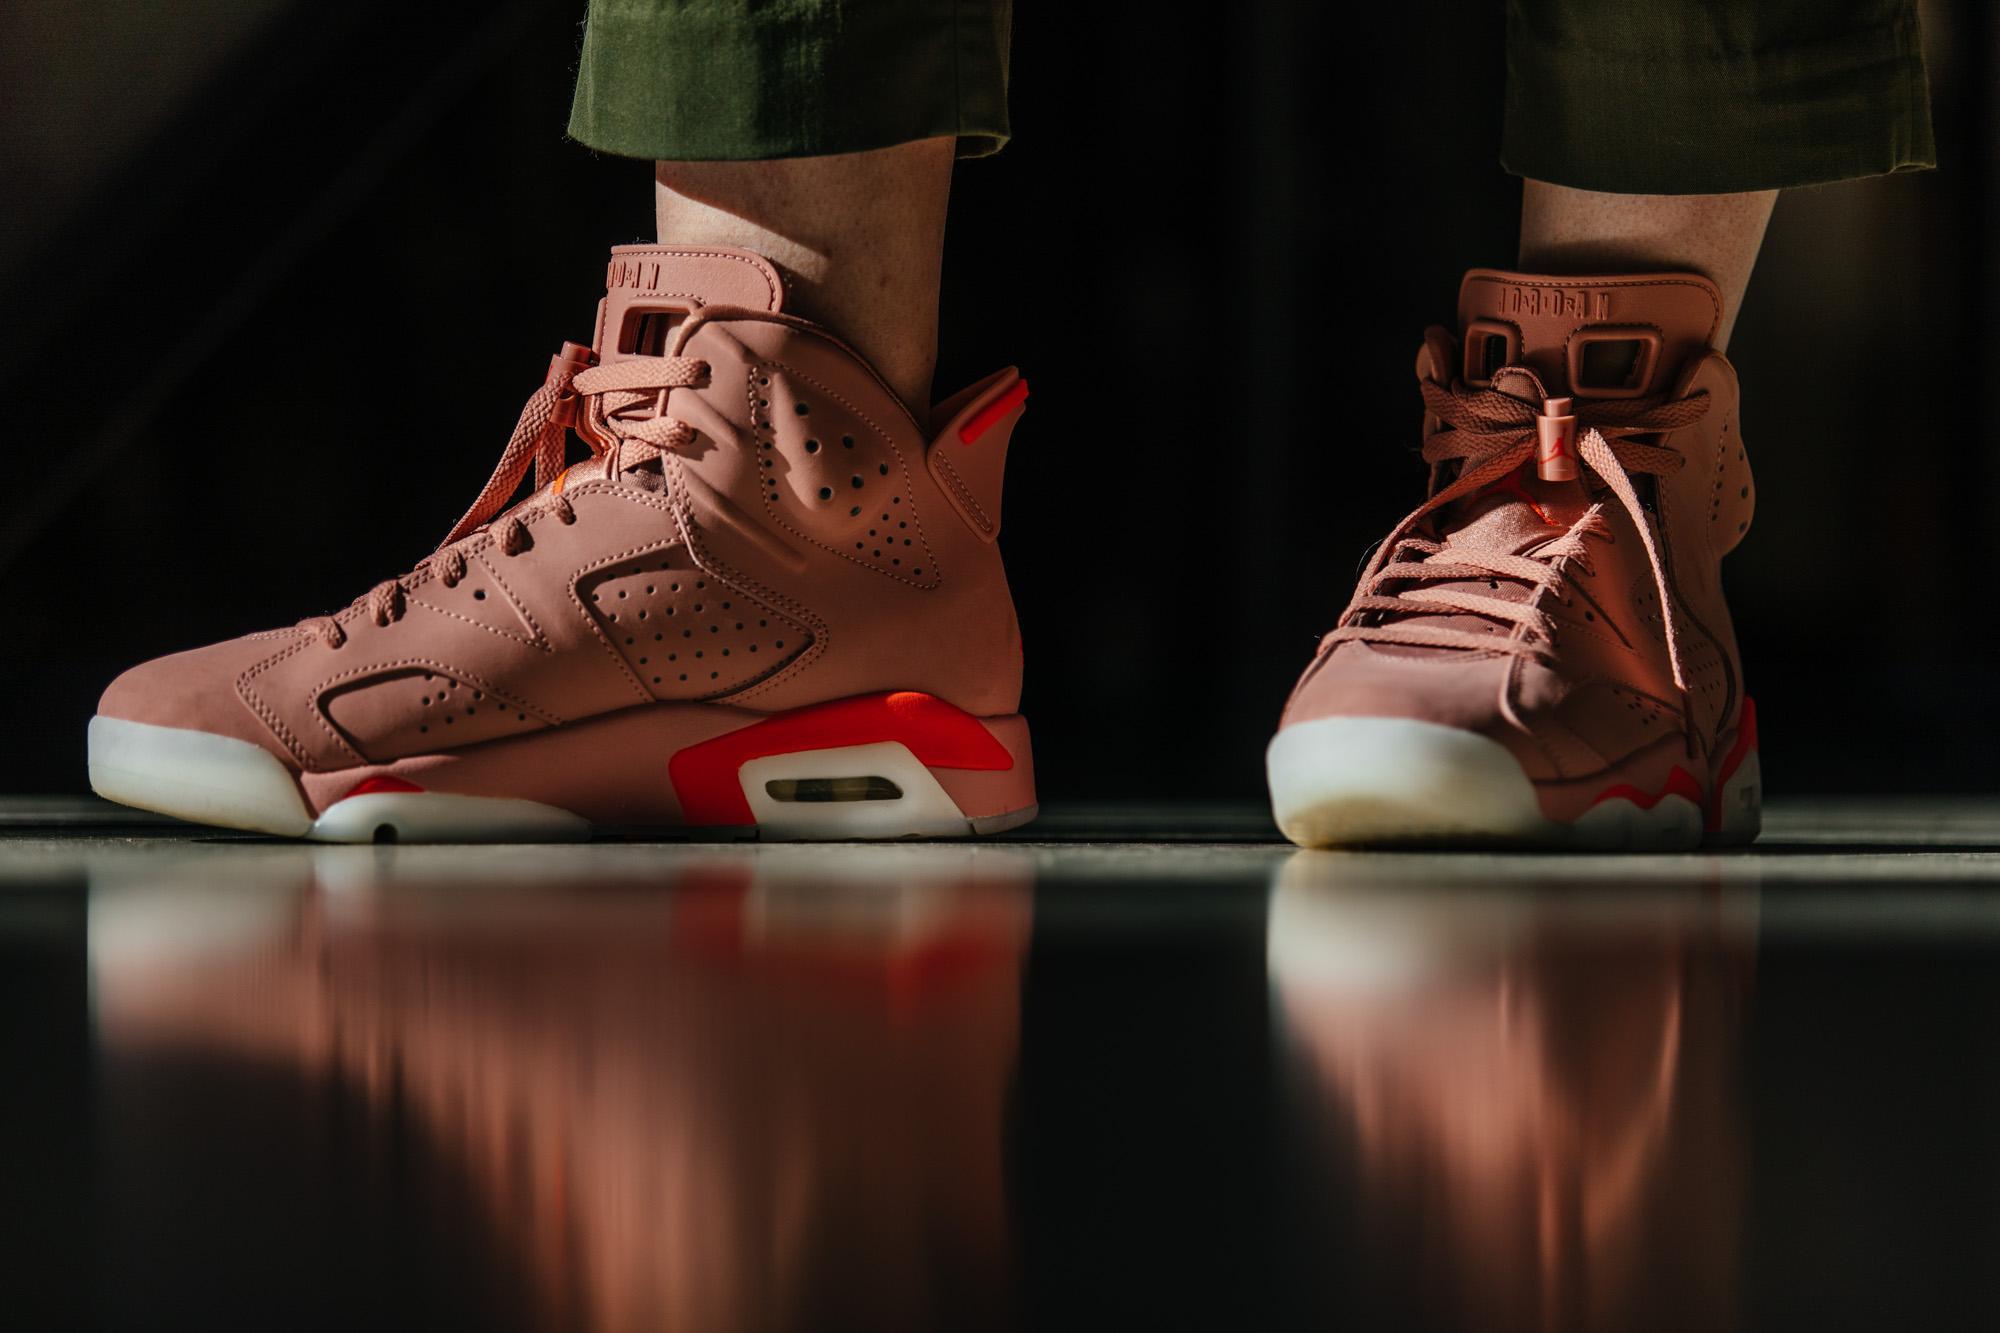 Annalisa's Jordans...